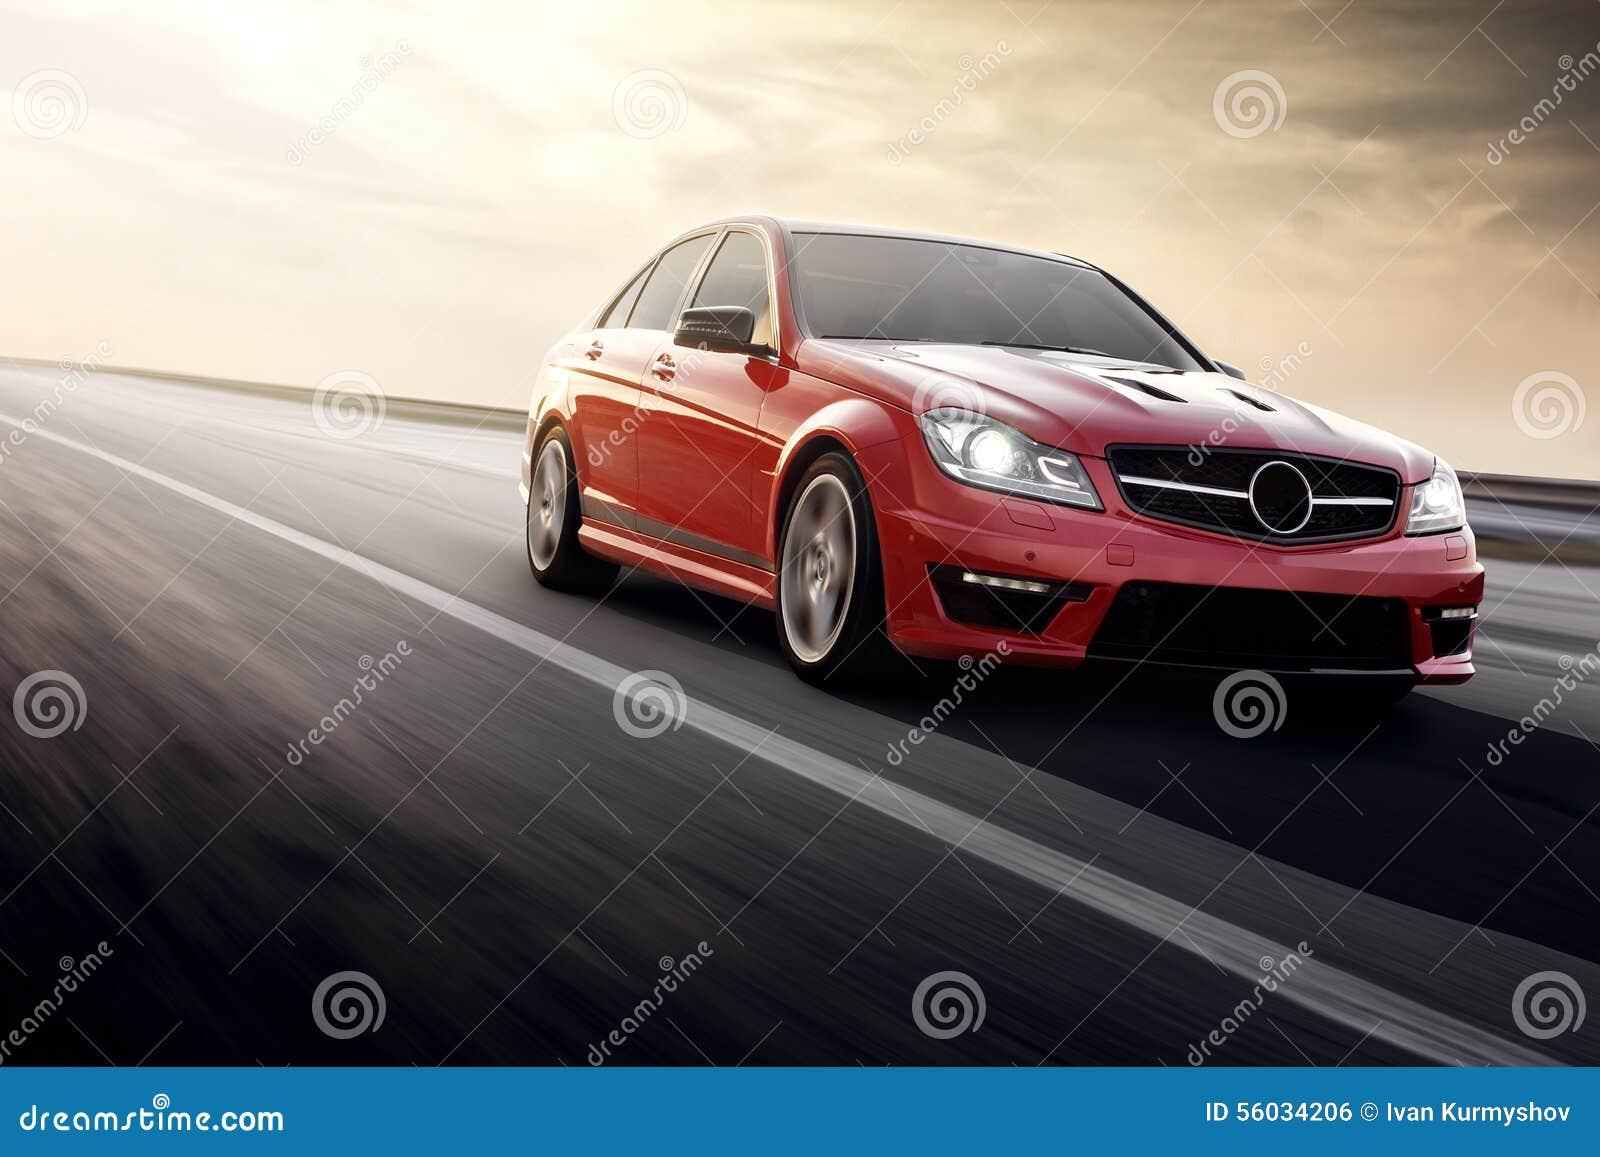 vitesse de voiture photo stock image du automobile transport 56034206. Black Bedroom Furniture Sets. Home Design Ideas